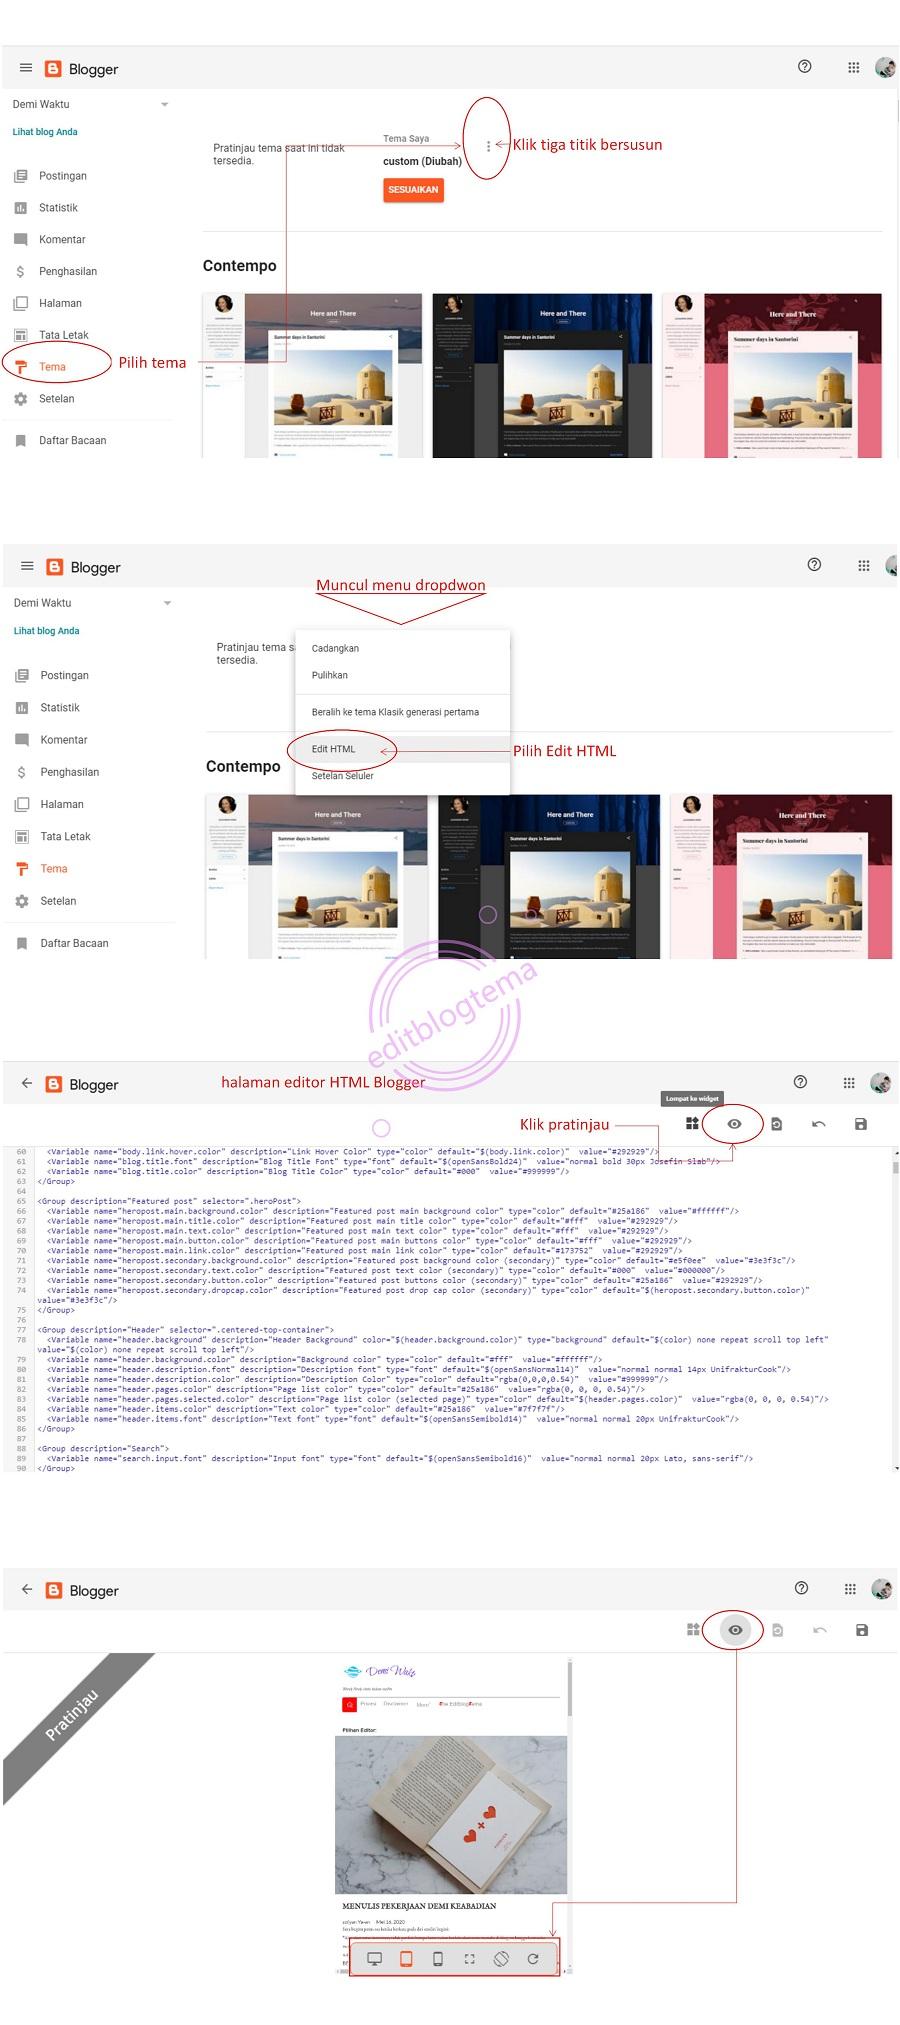 petunjuk mengakses edditor HTML blogger